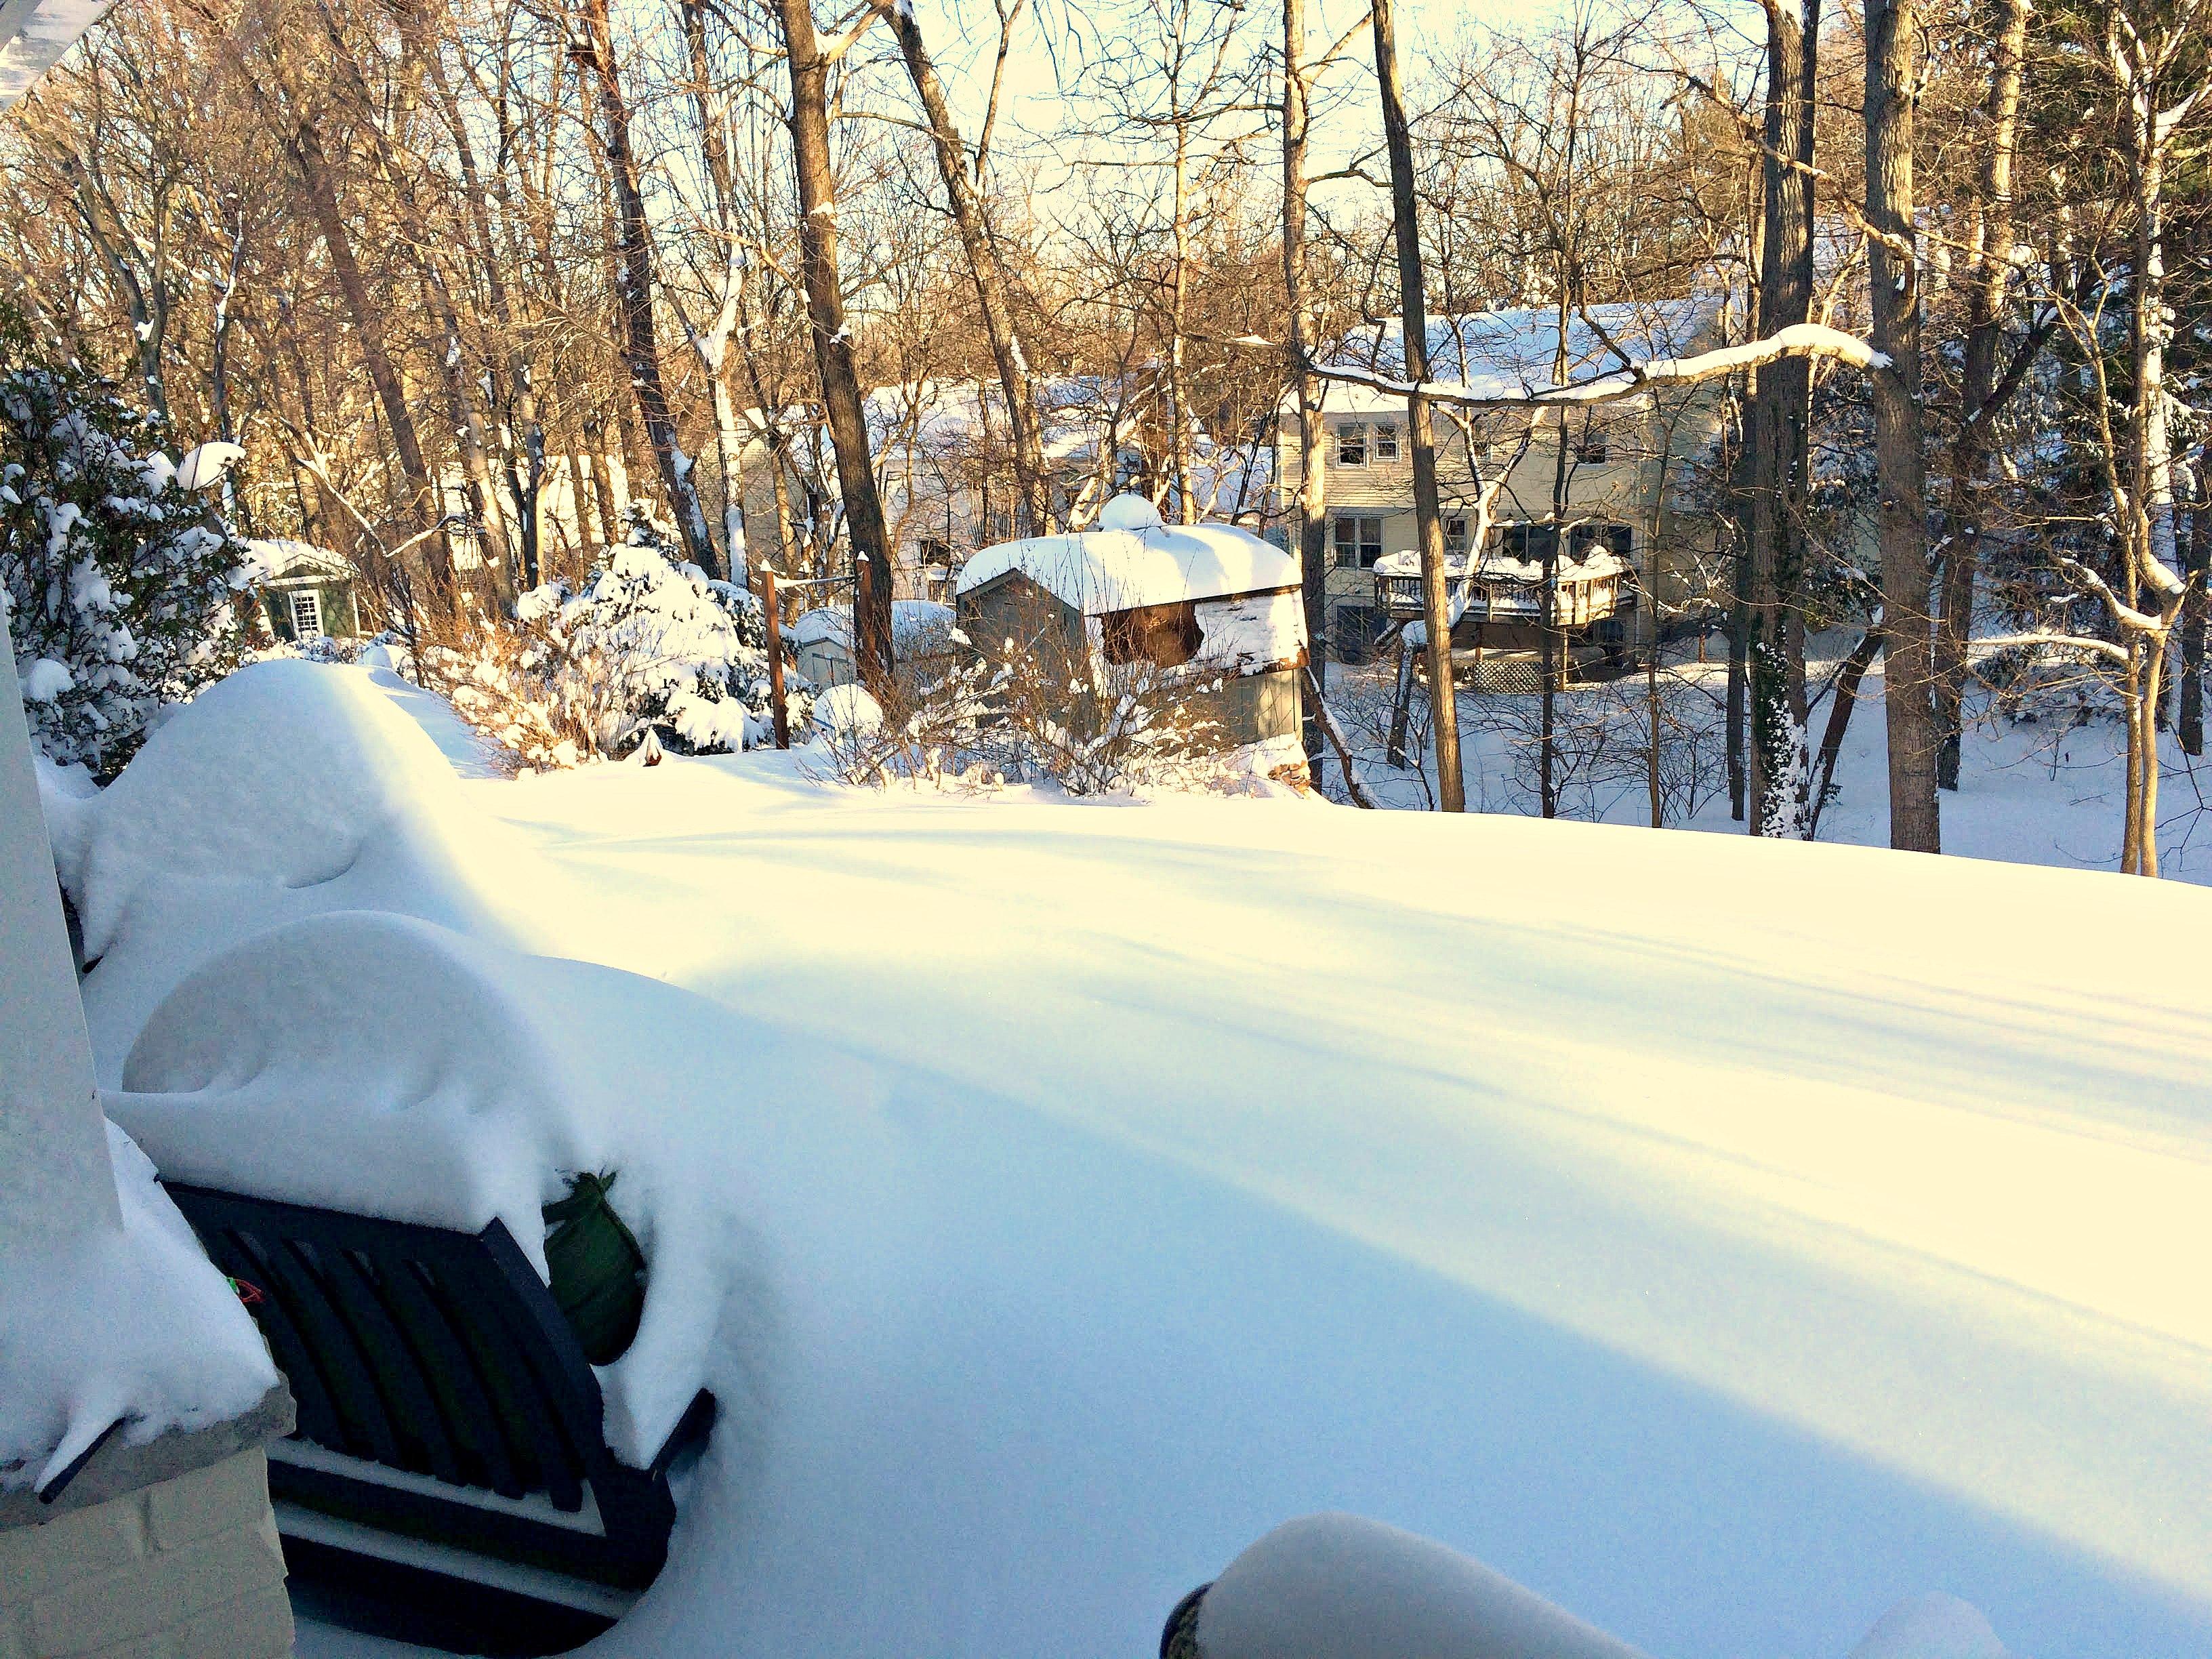 blizzard 2016 backyard vienna